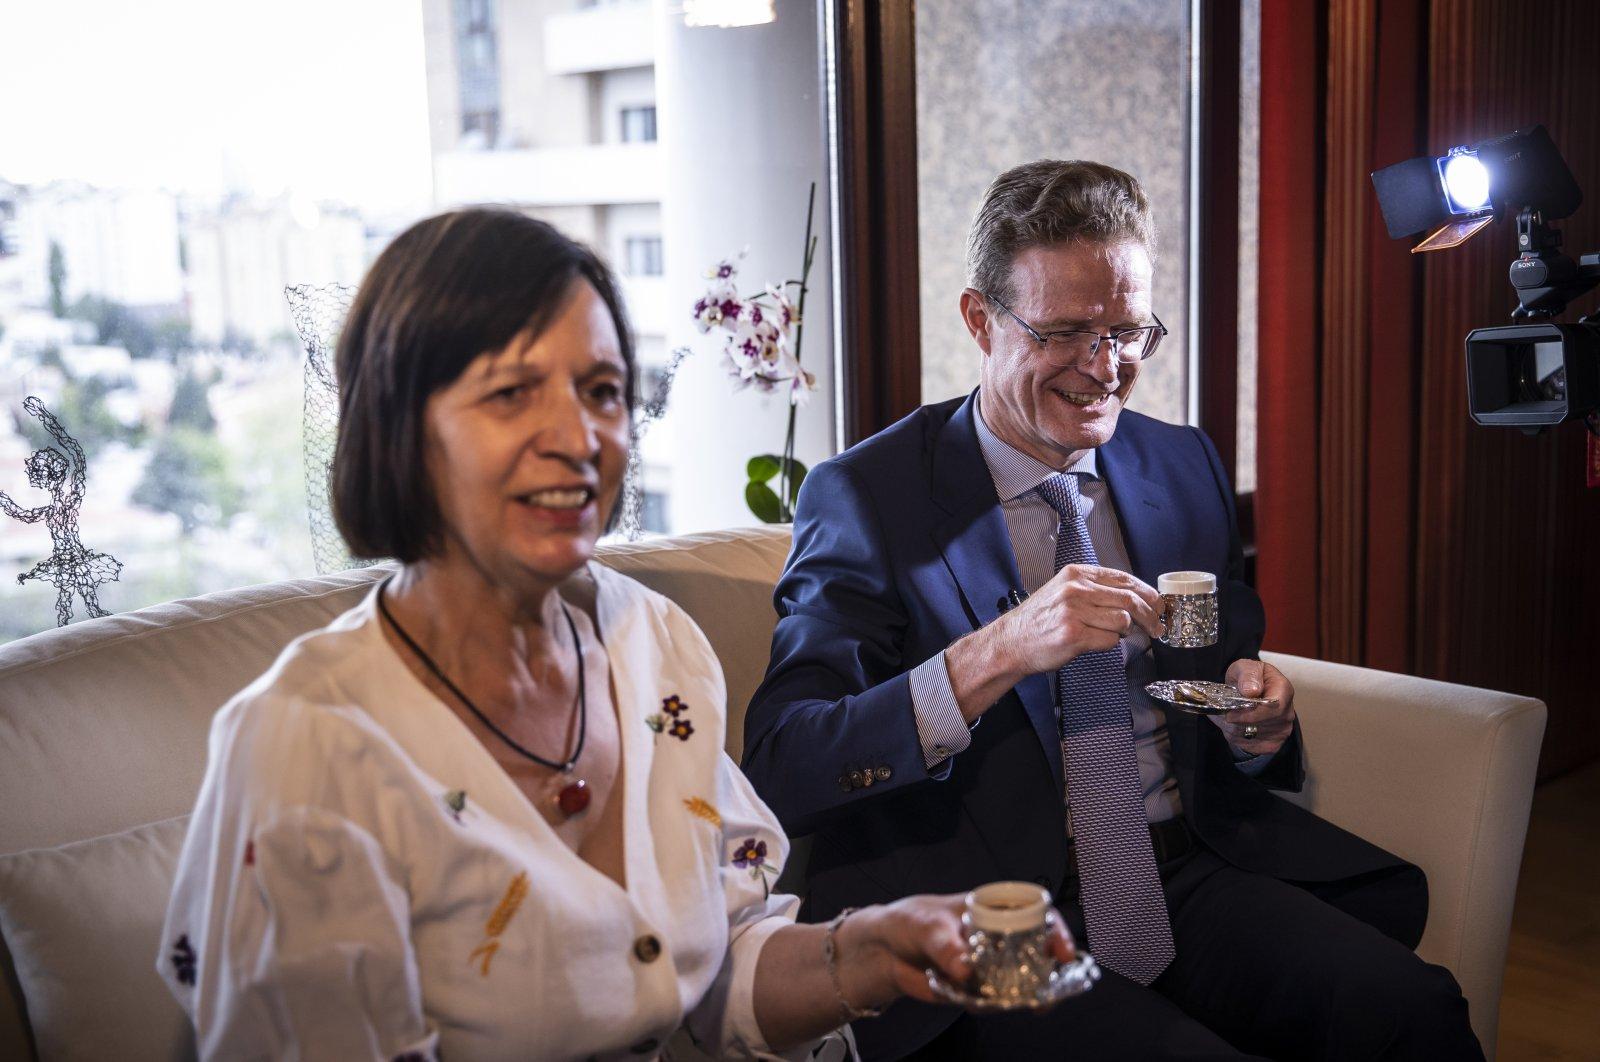 Nikolaus Meyer-Landrut, head of the EU Delegation to Turkey together with his wife, Brigitte Meyer-Landrut, are seen in Ankara, Turkey, May 7, 2021. (AA Photo)